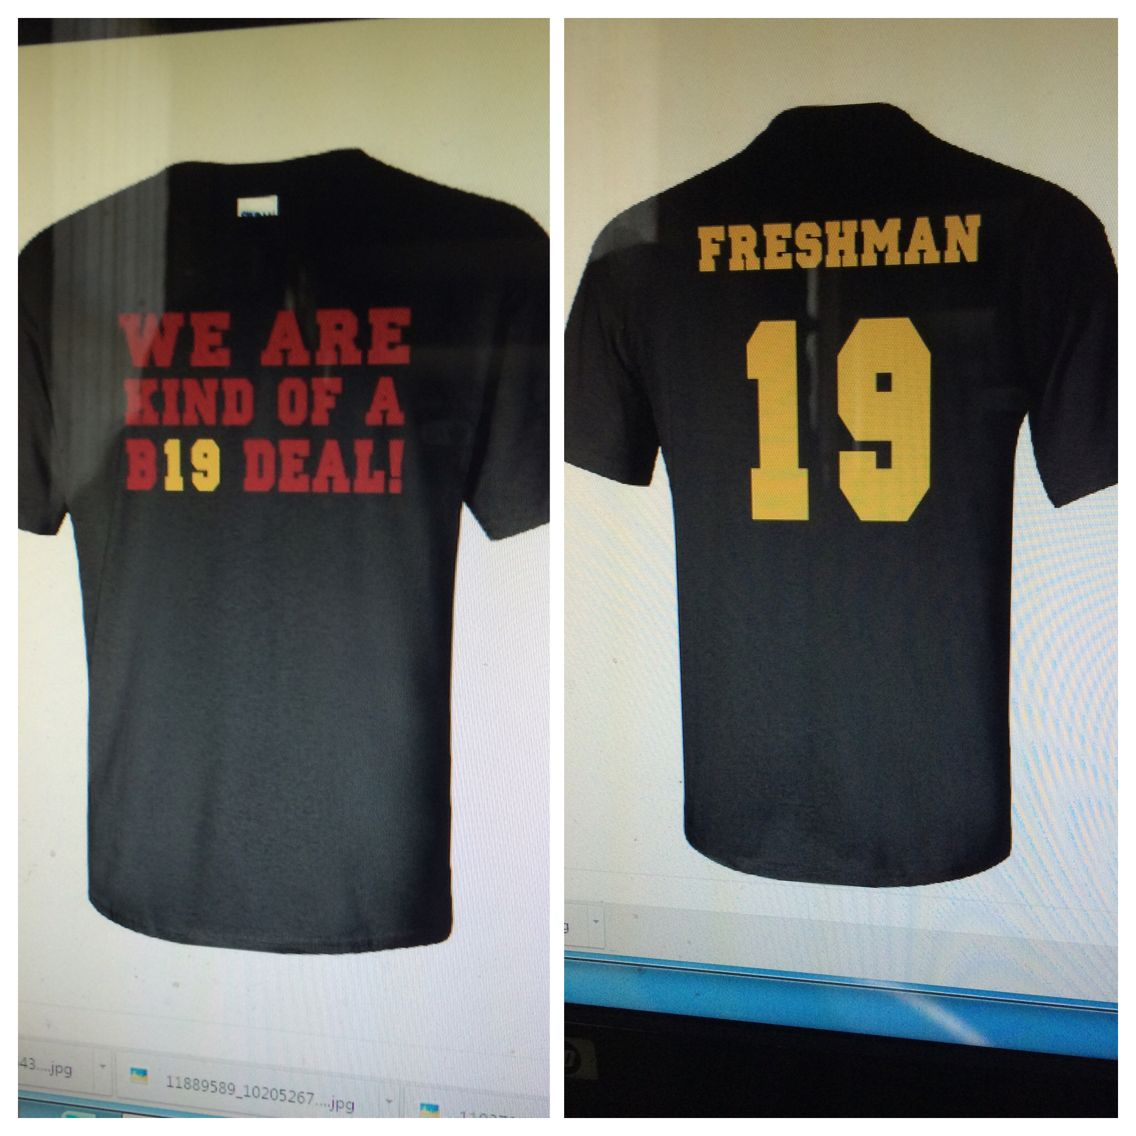 T shirt design ideas for schools - Freshmen Class Tee Shirts